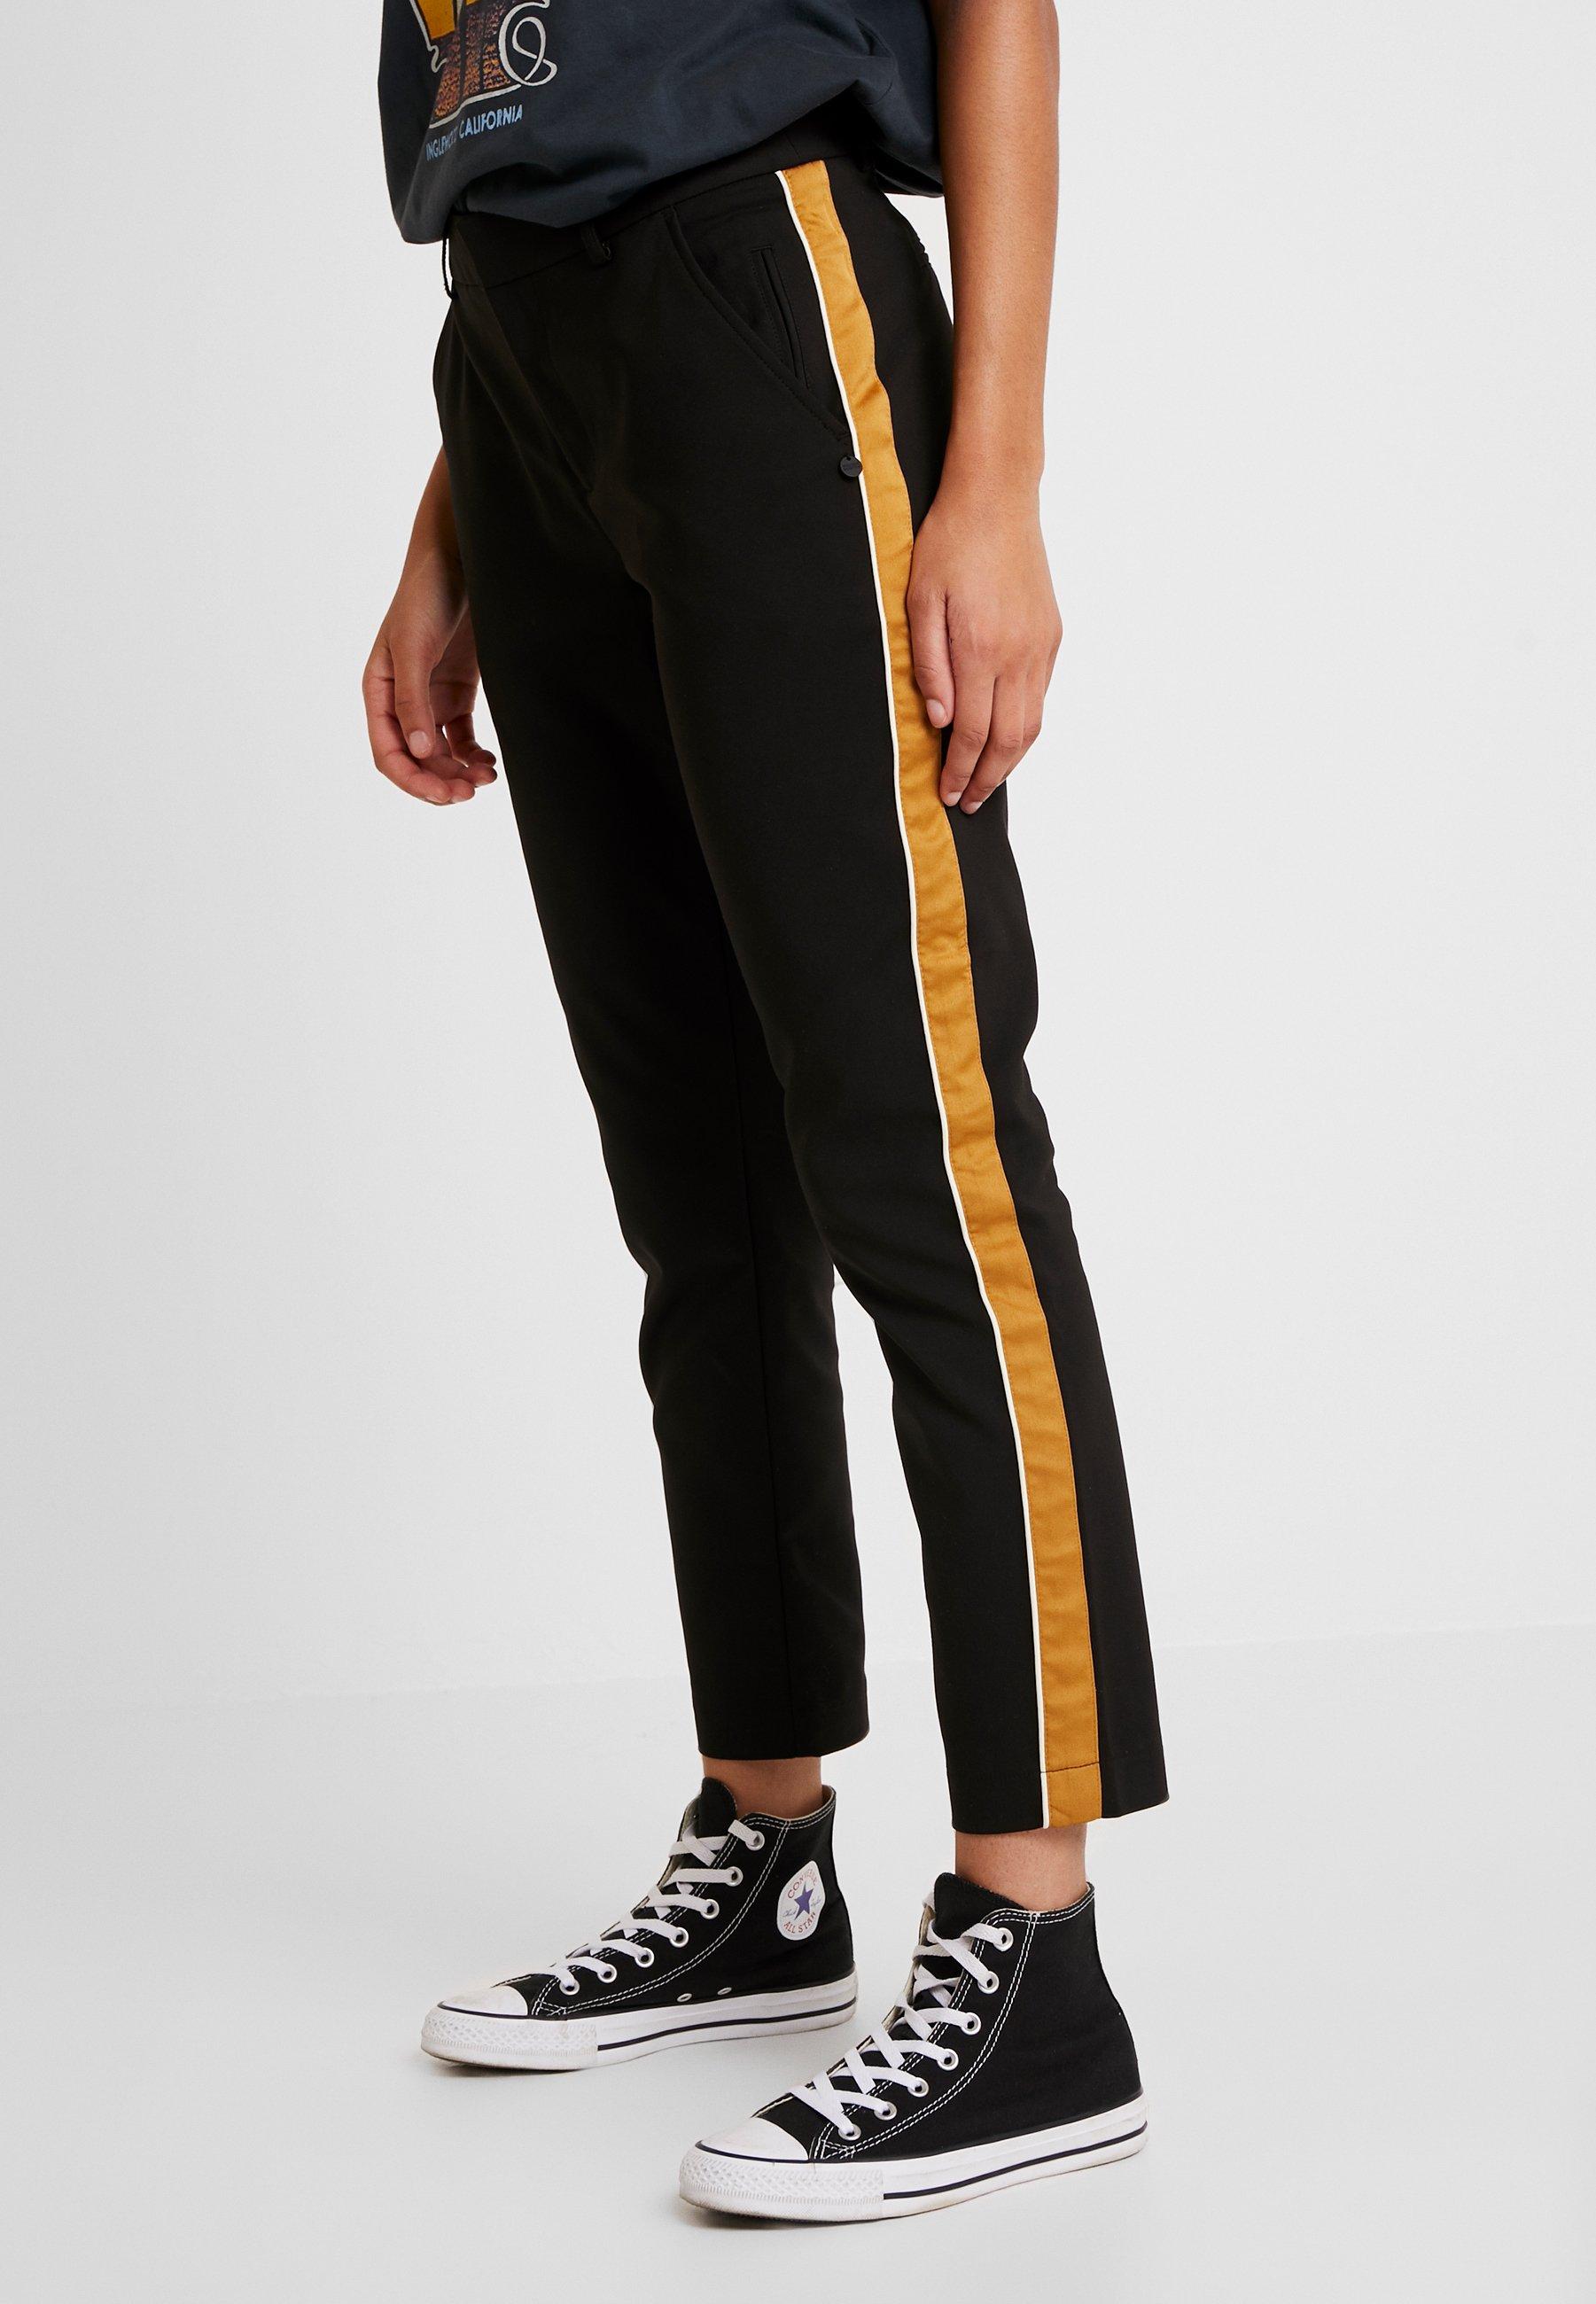 Soda Tailored Contrast Black Pants Side Classique With PanelPantalon Scotchamp; Stetch qSGUVzMp